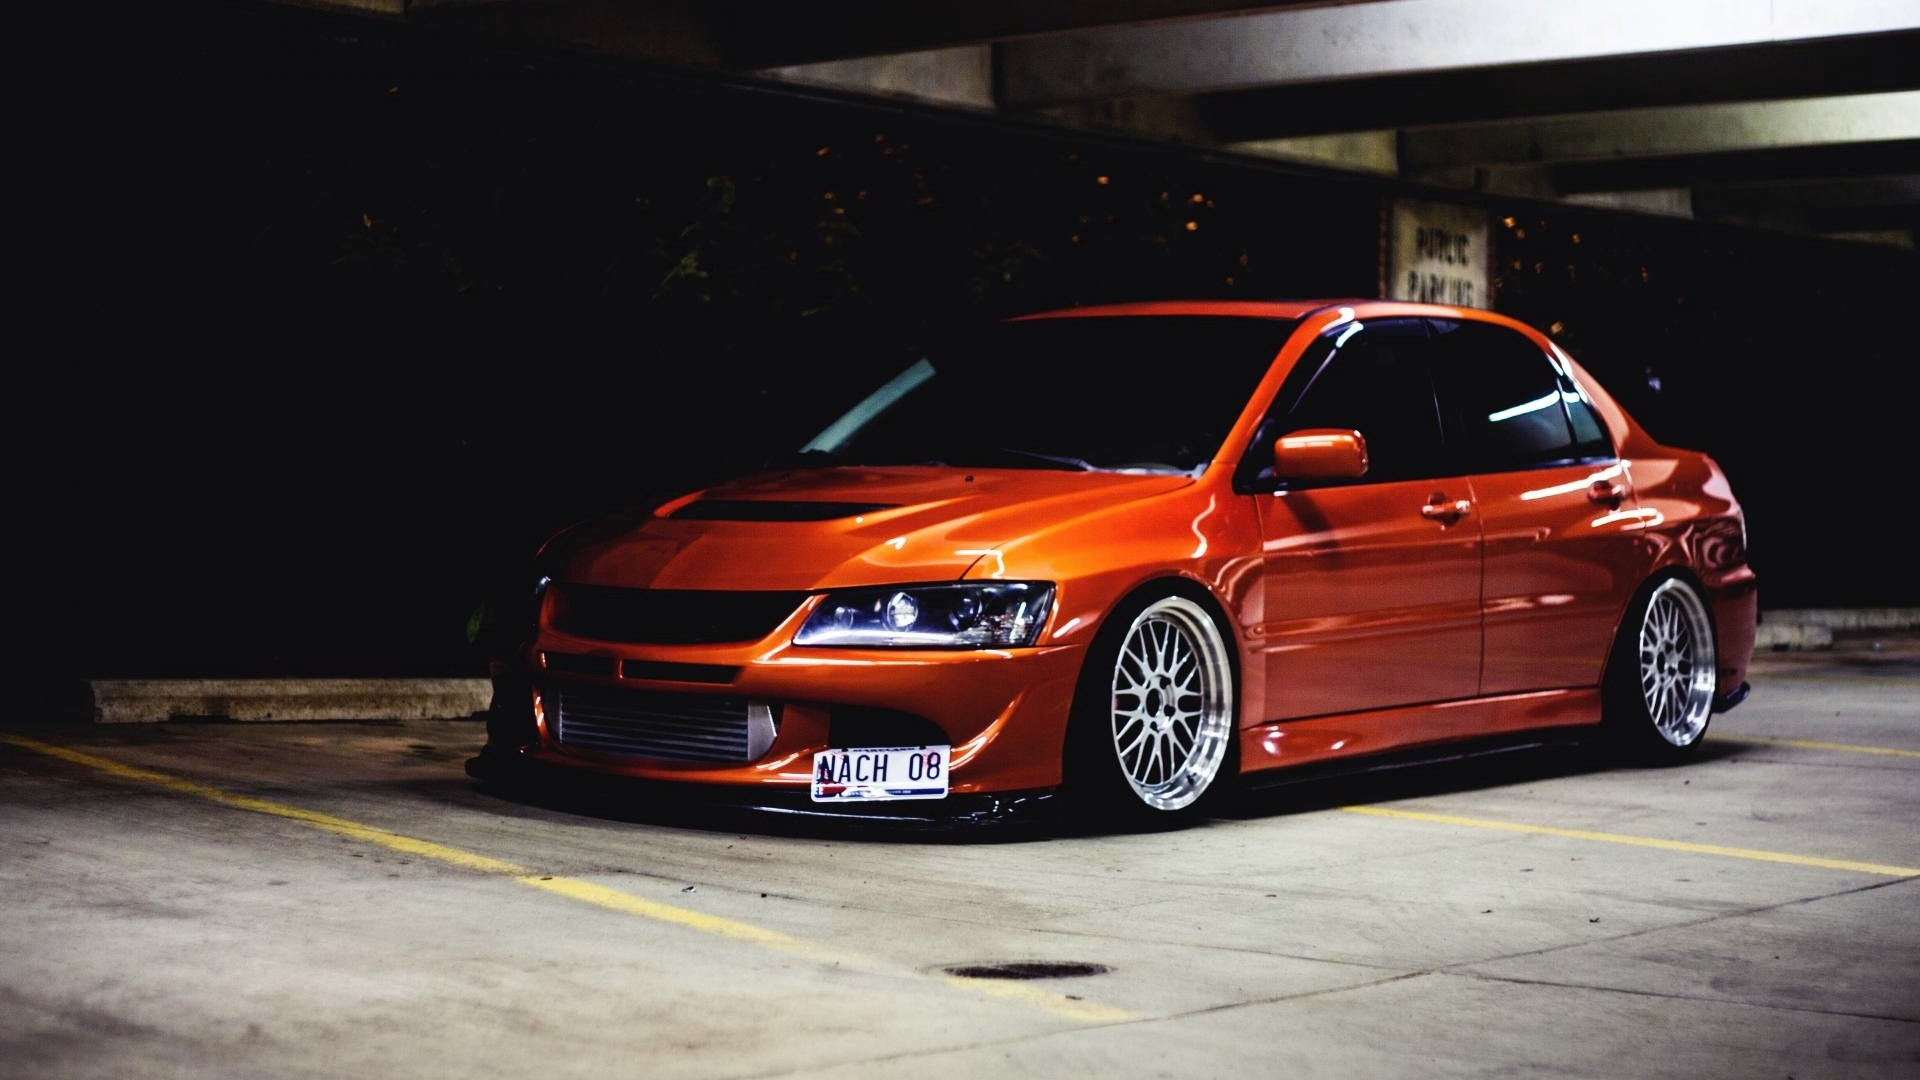 Here home car wallpapers orange car mitsubishi lancer evolution